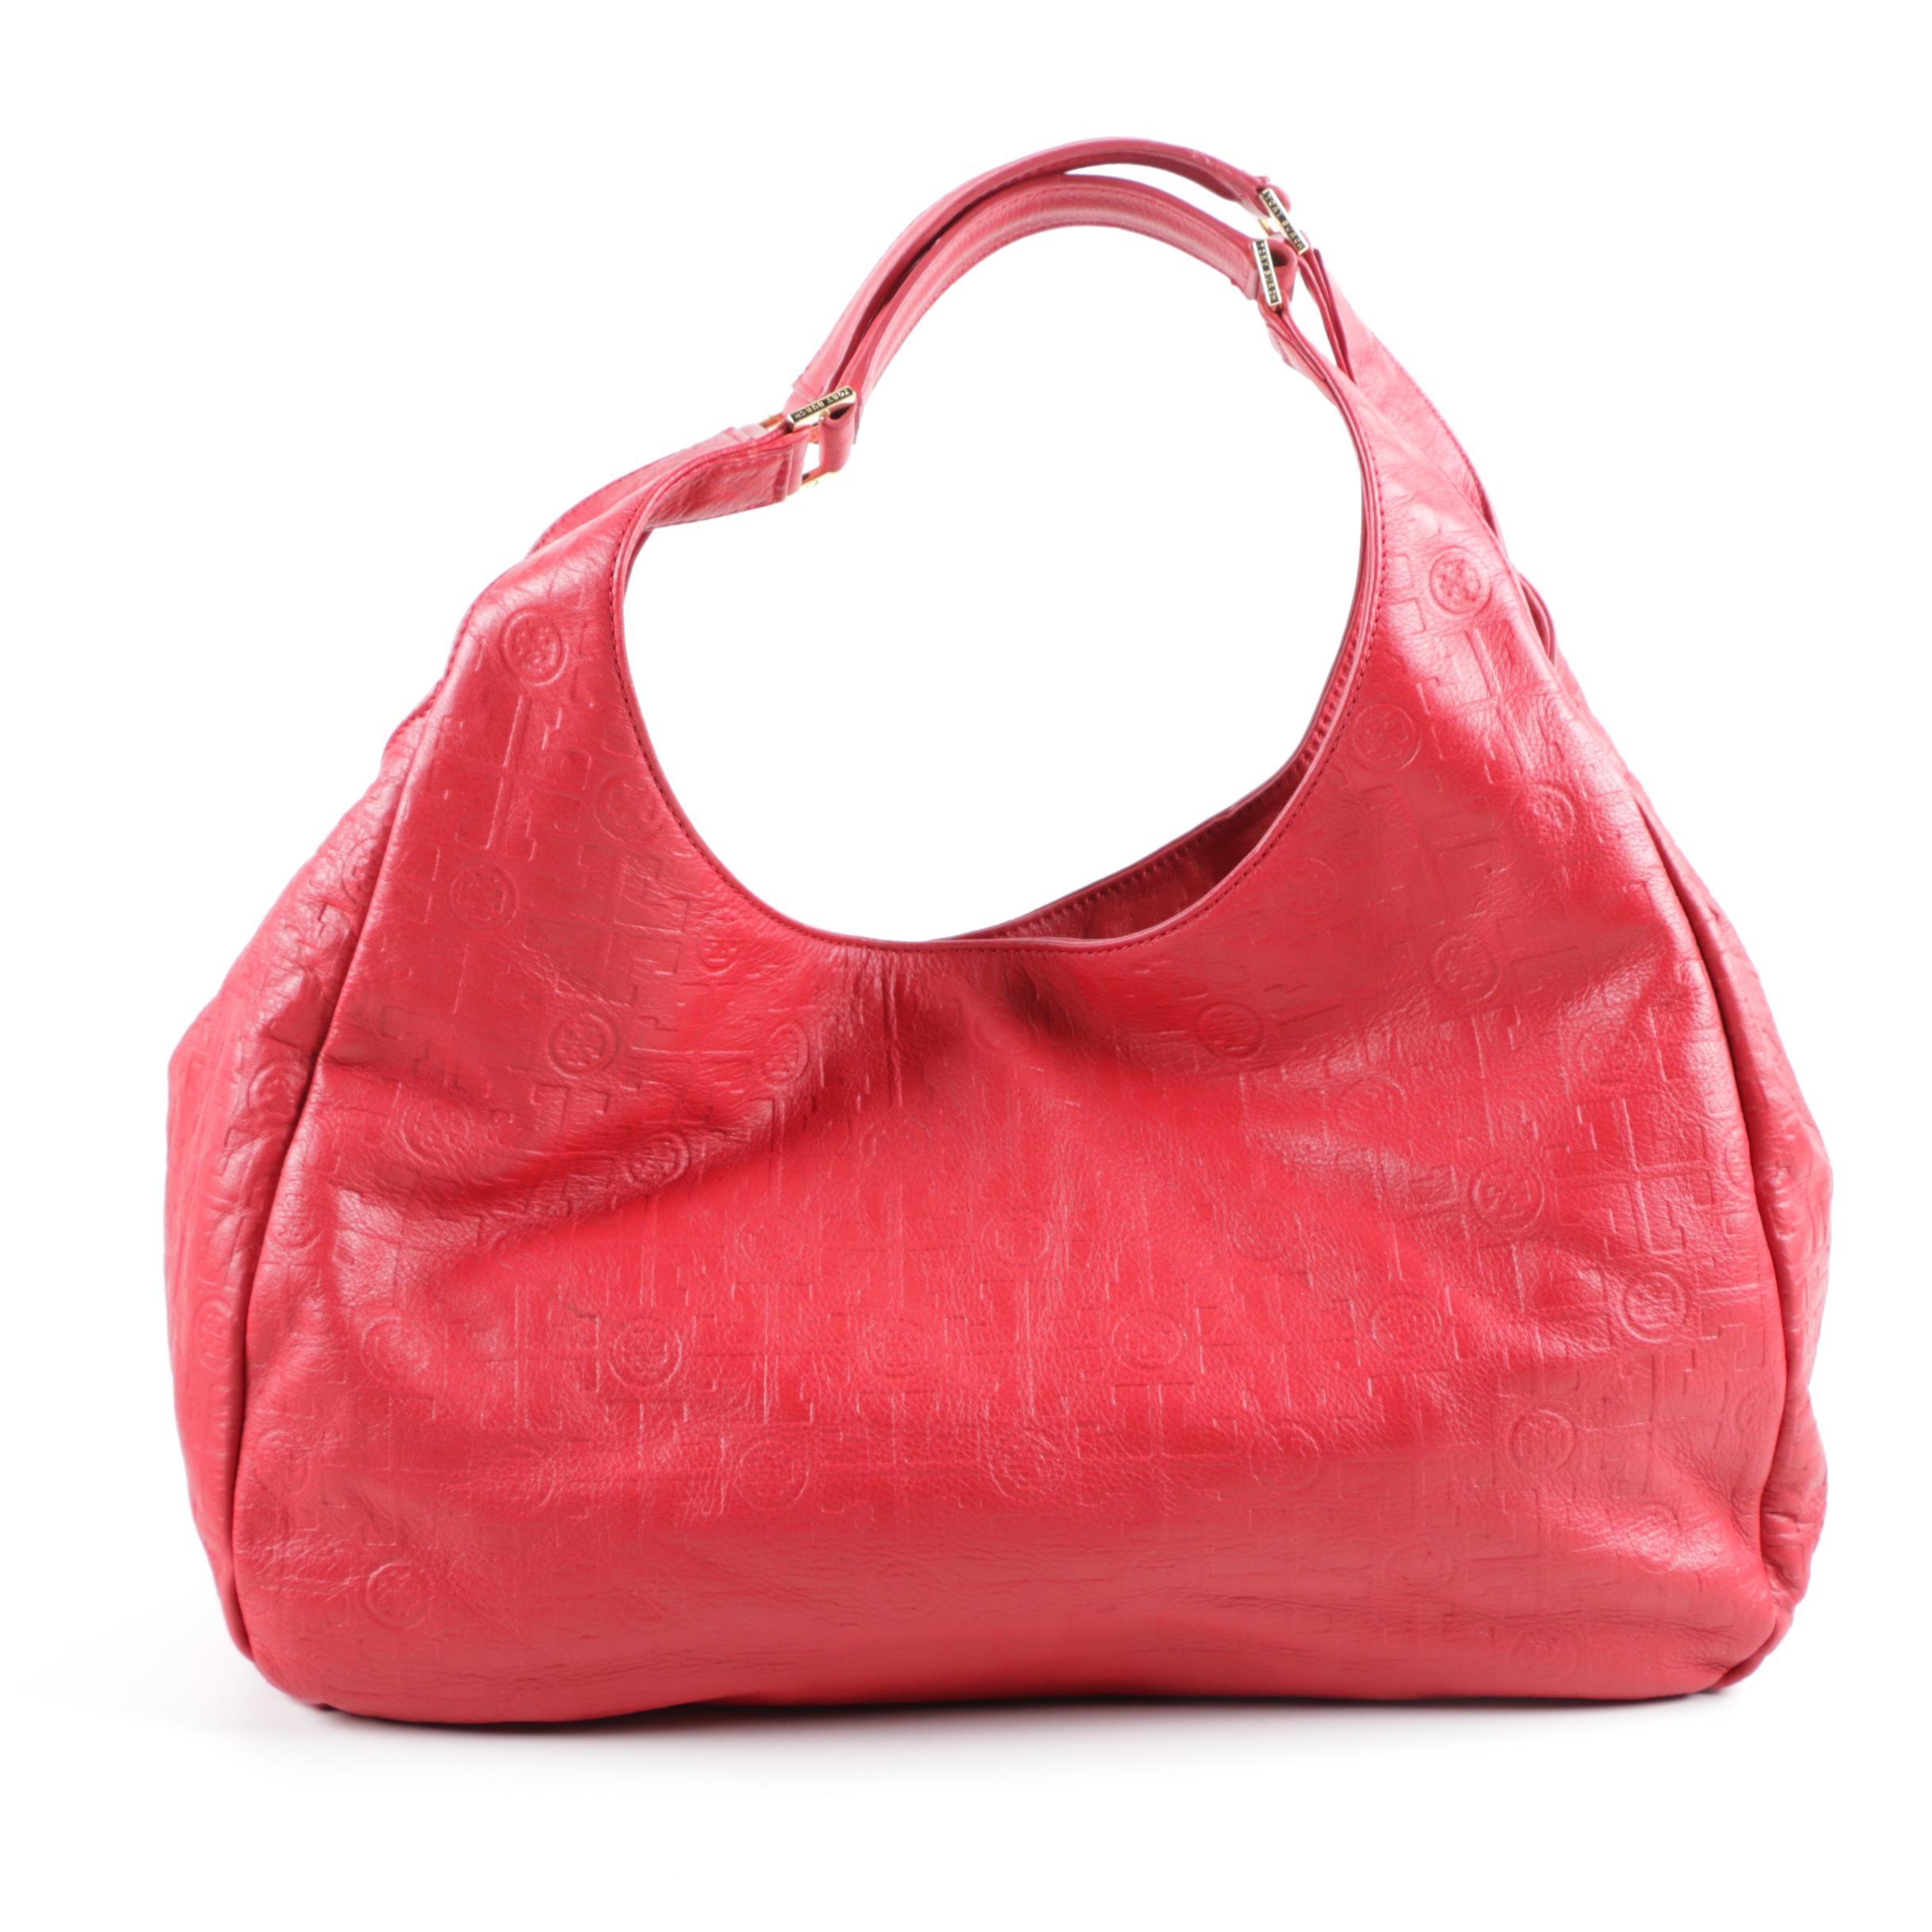 Tory Burch Monogrammed Red Leather Handbag